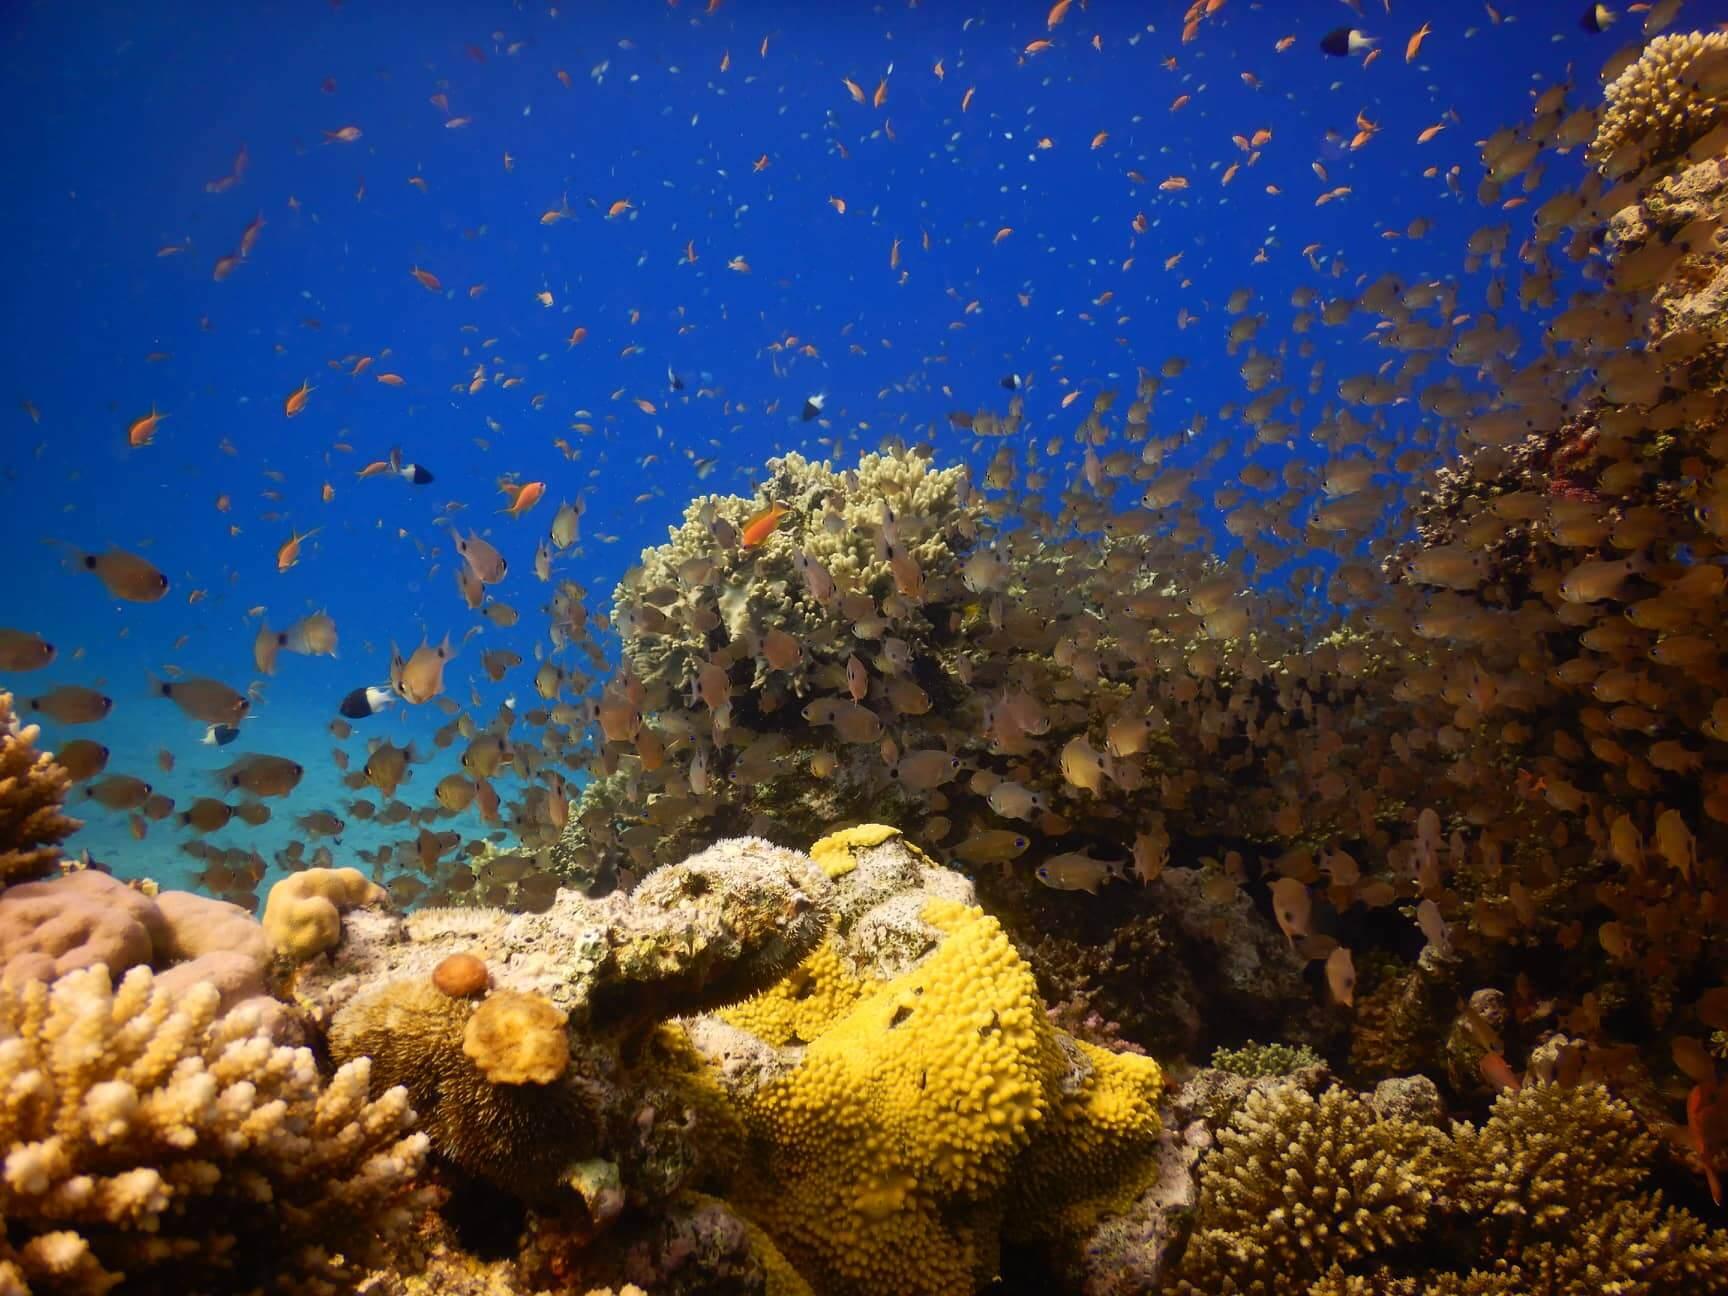 Egypt-REDSEA-Hurghada-DivePro-Academy-Scuba-Diving-Center-Coral-Reef-8